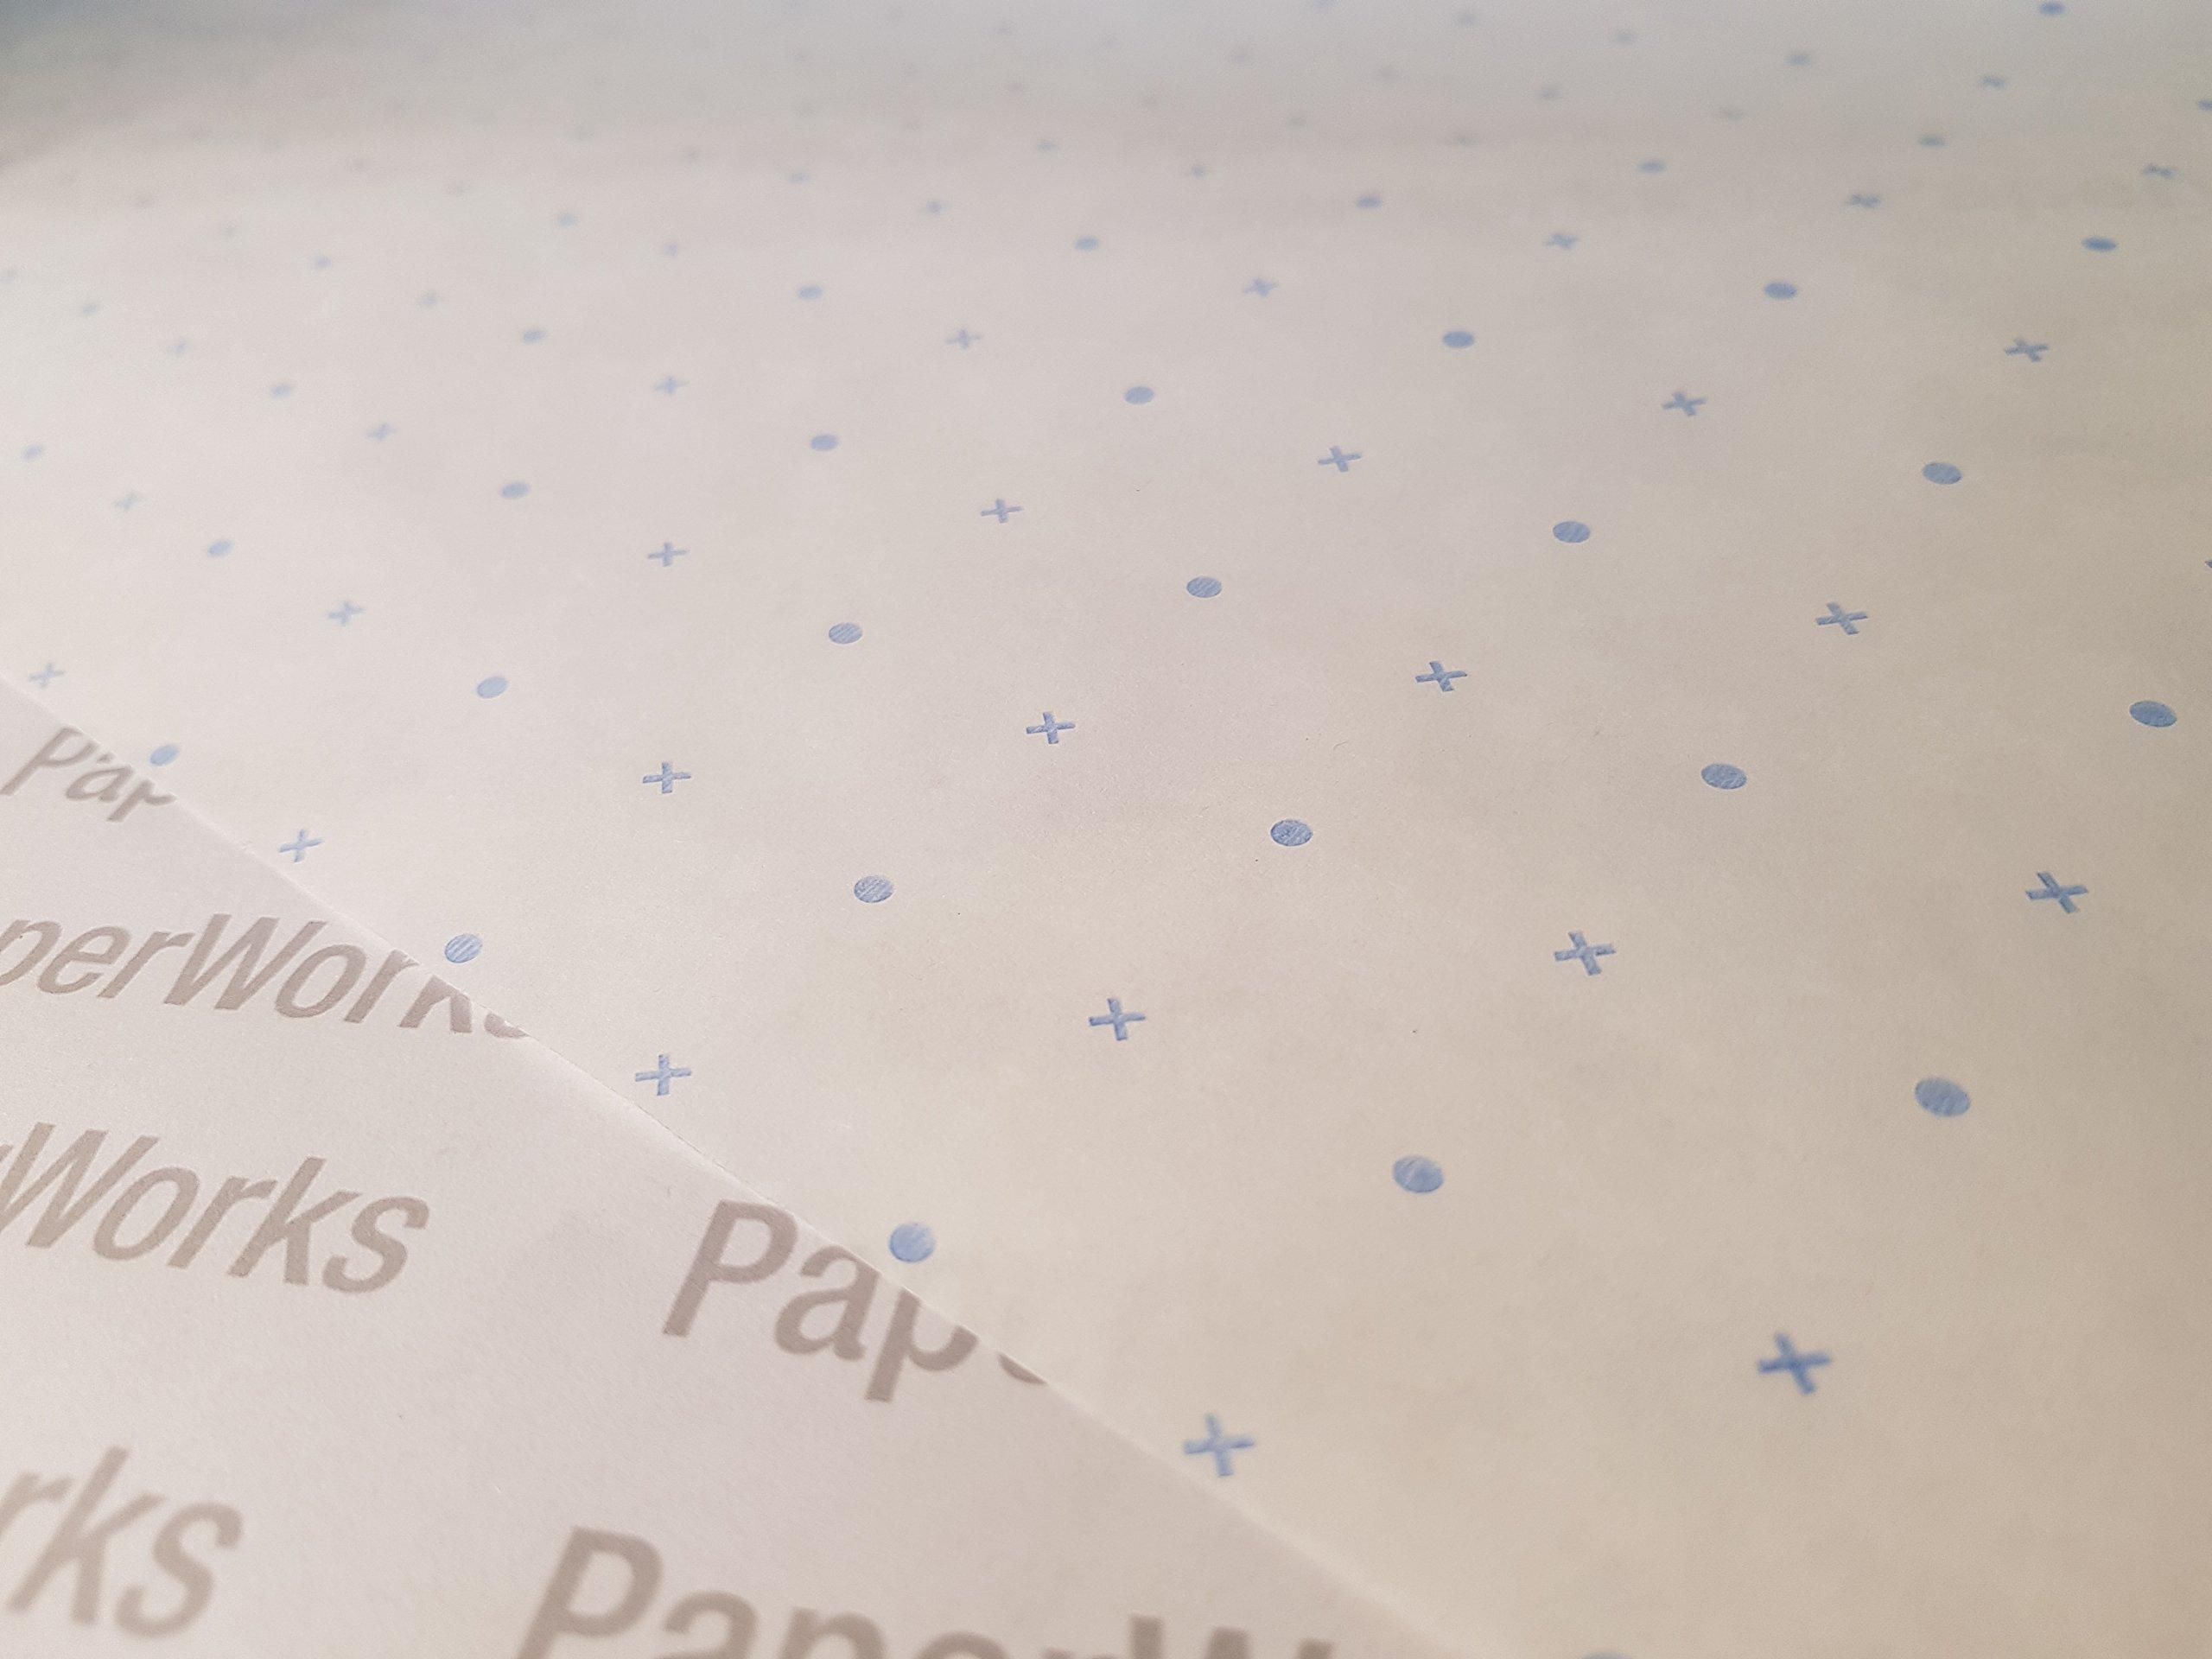 Sewing Pattern Paper Spot Dot Cross for Marking Designs Dressmaking - 20 Meters